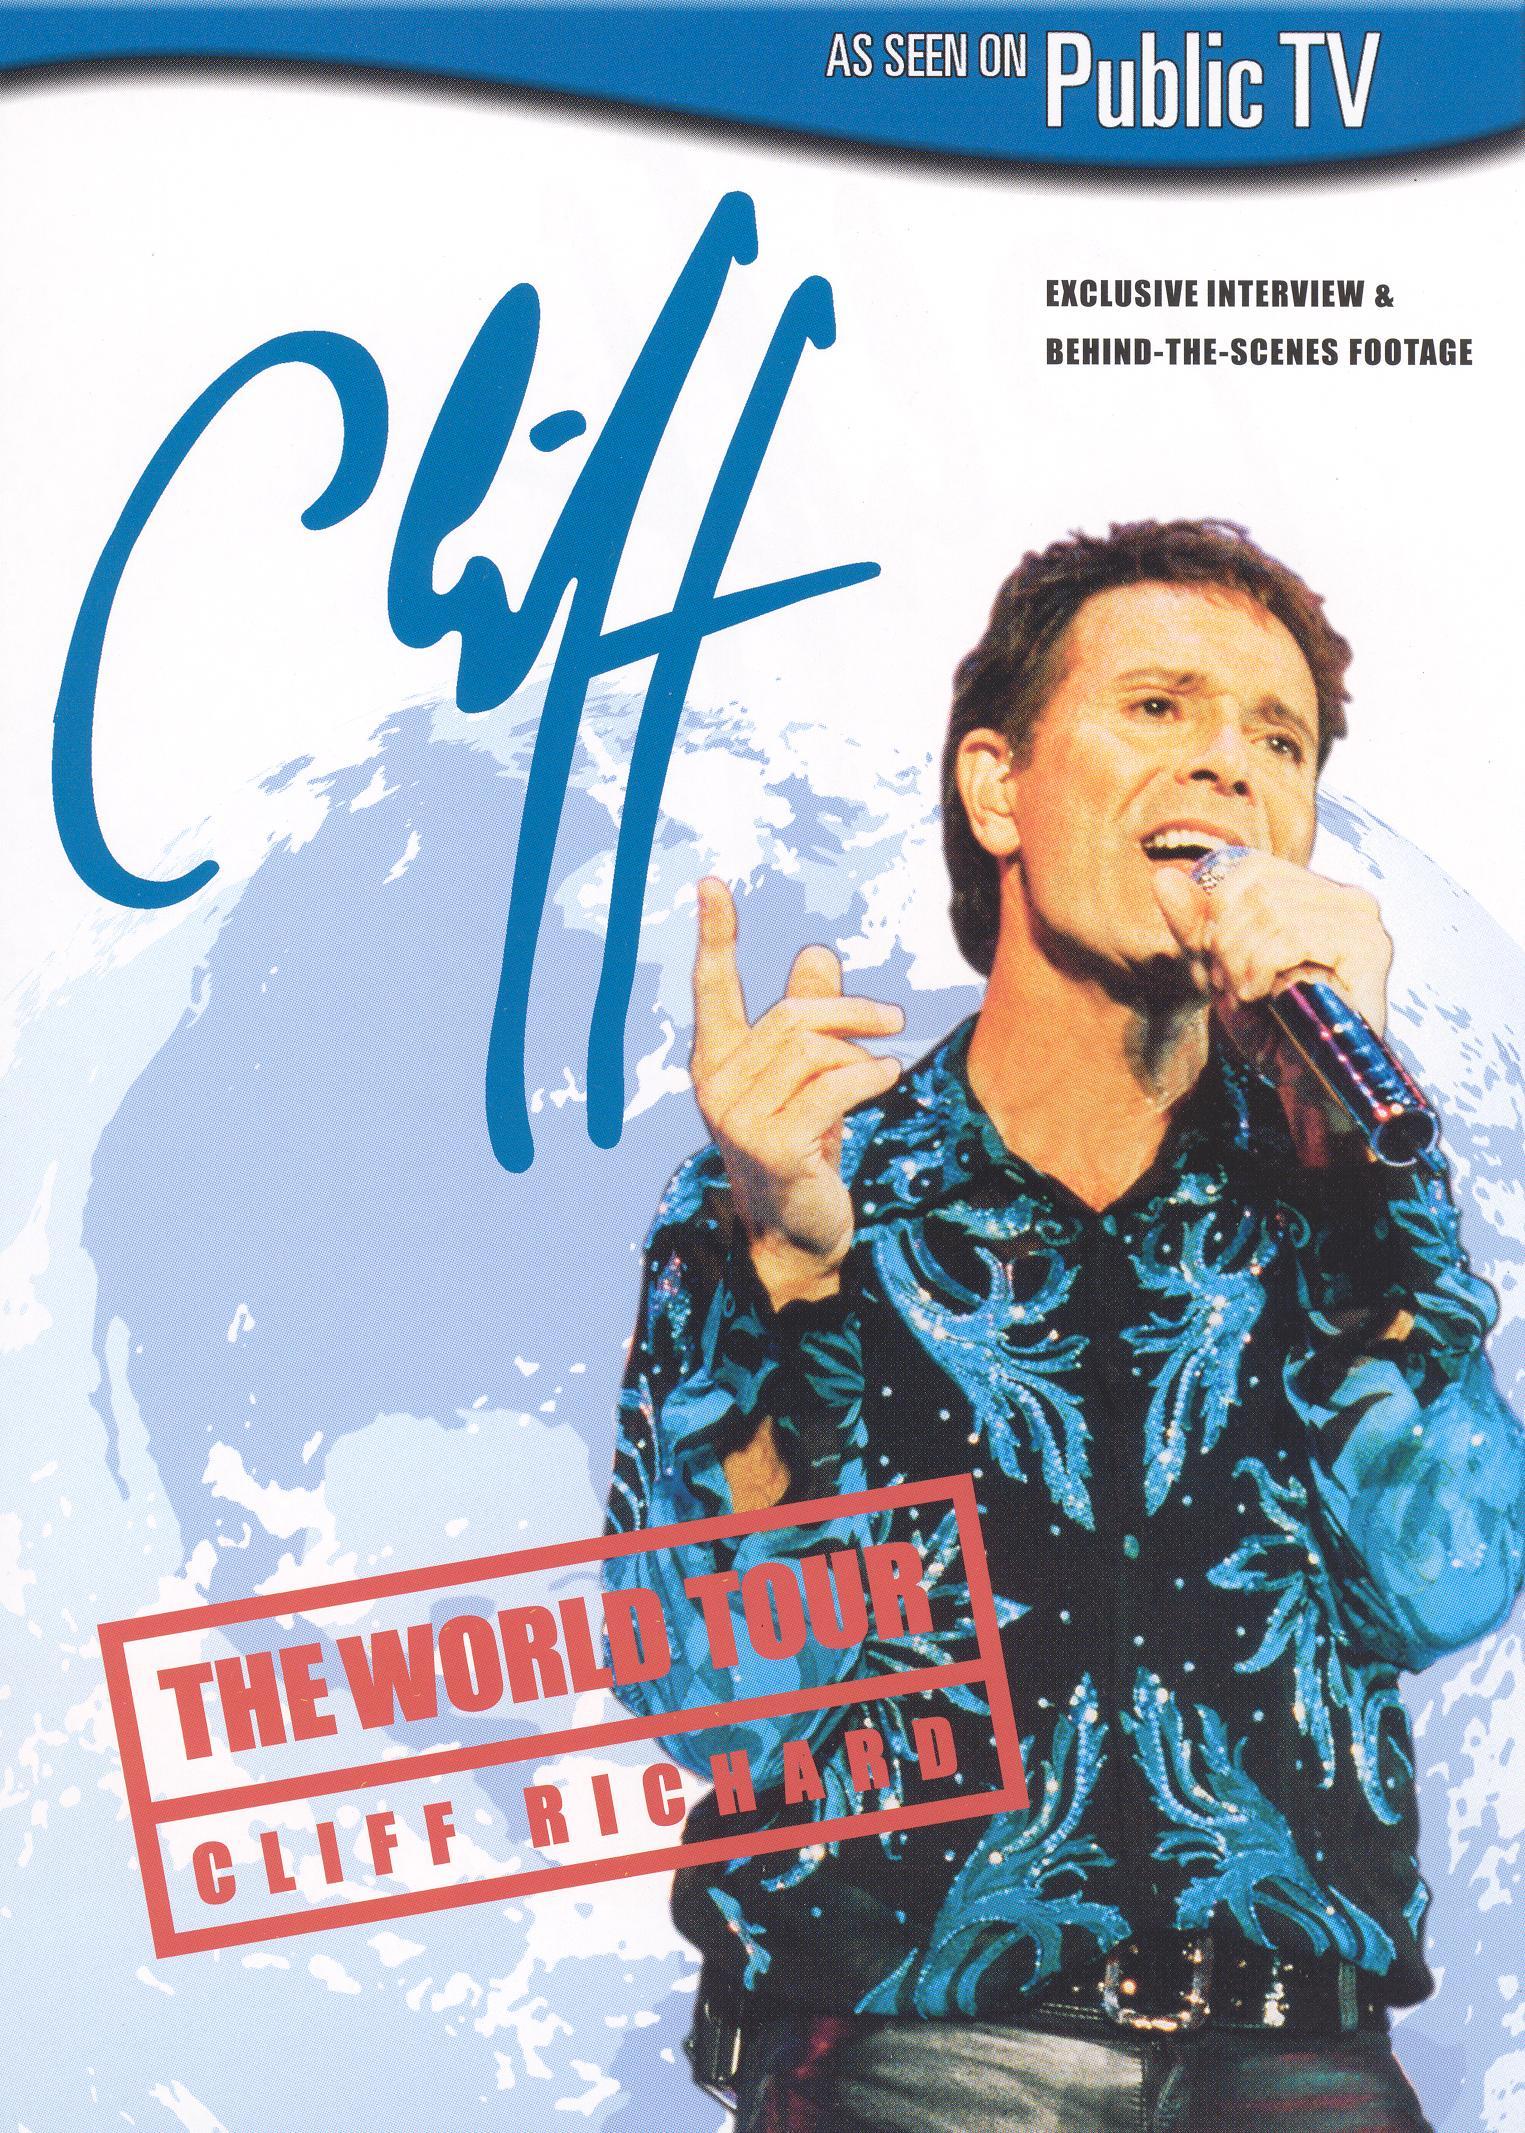 Cliff Richard: World Tour 2003